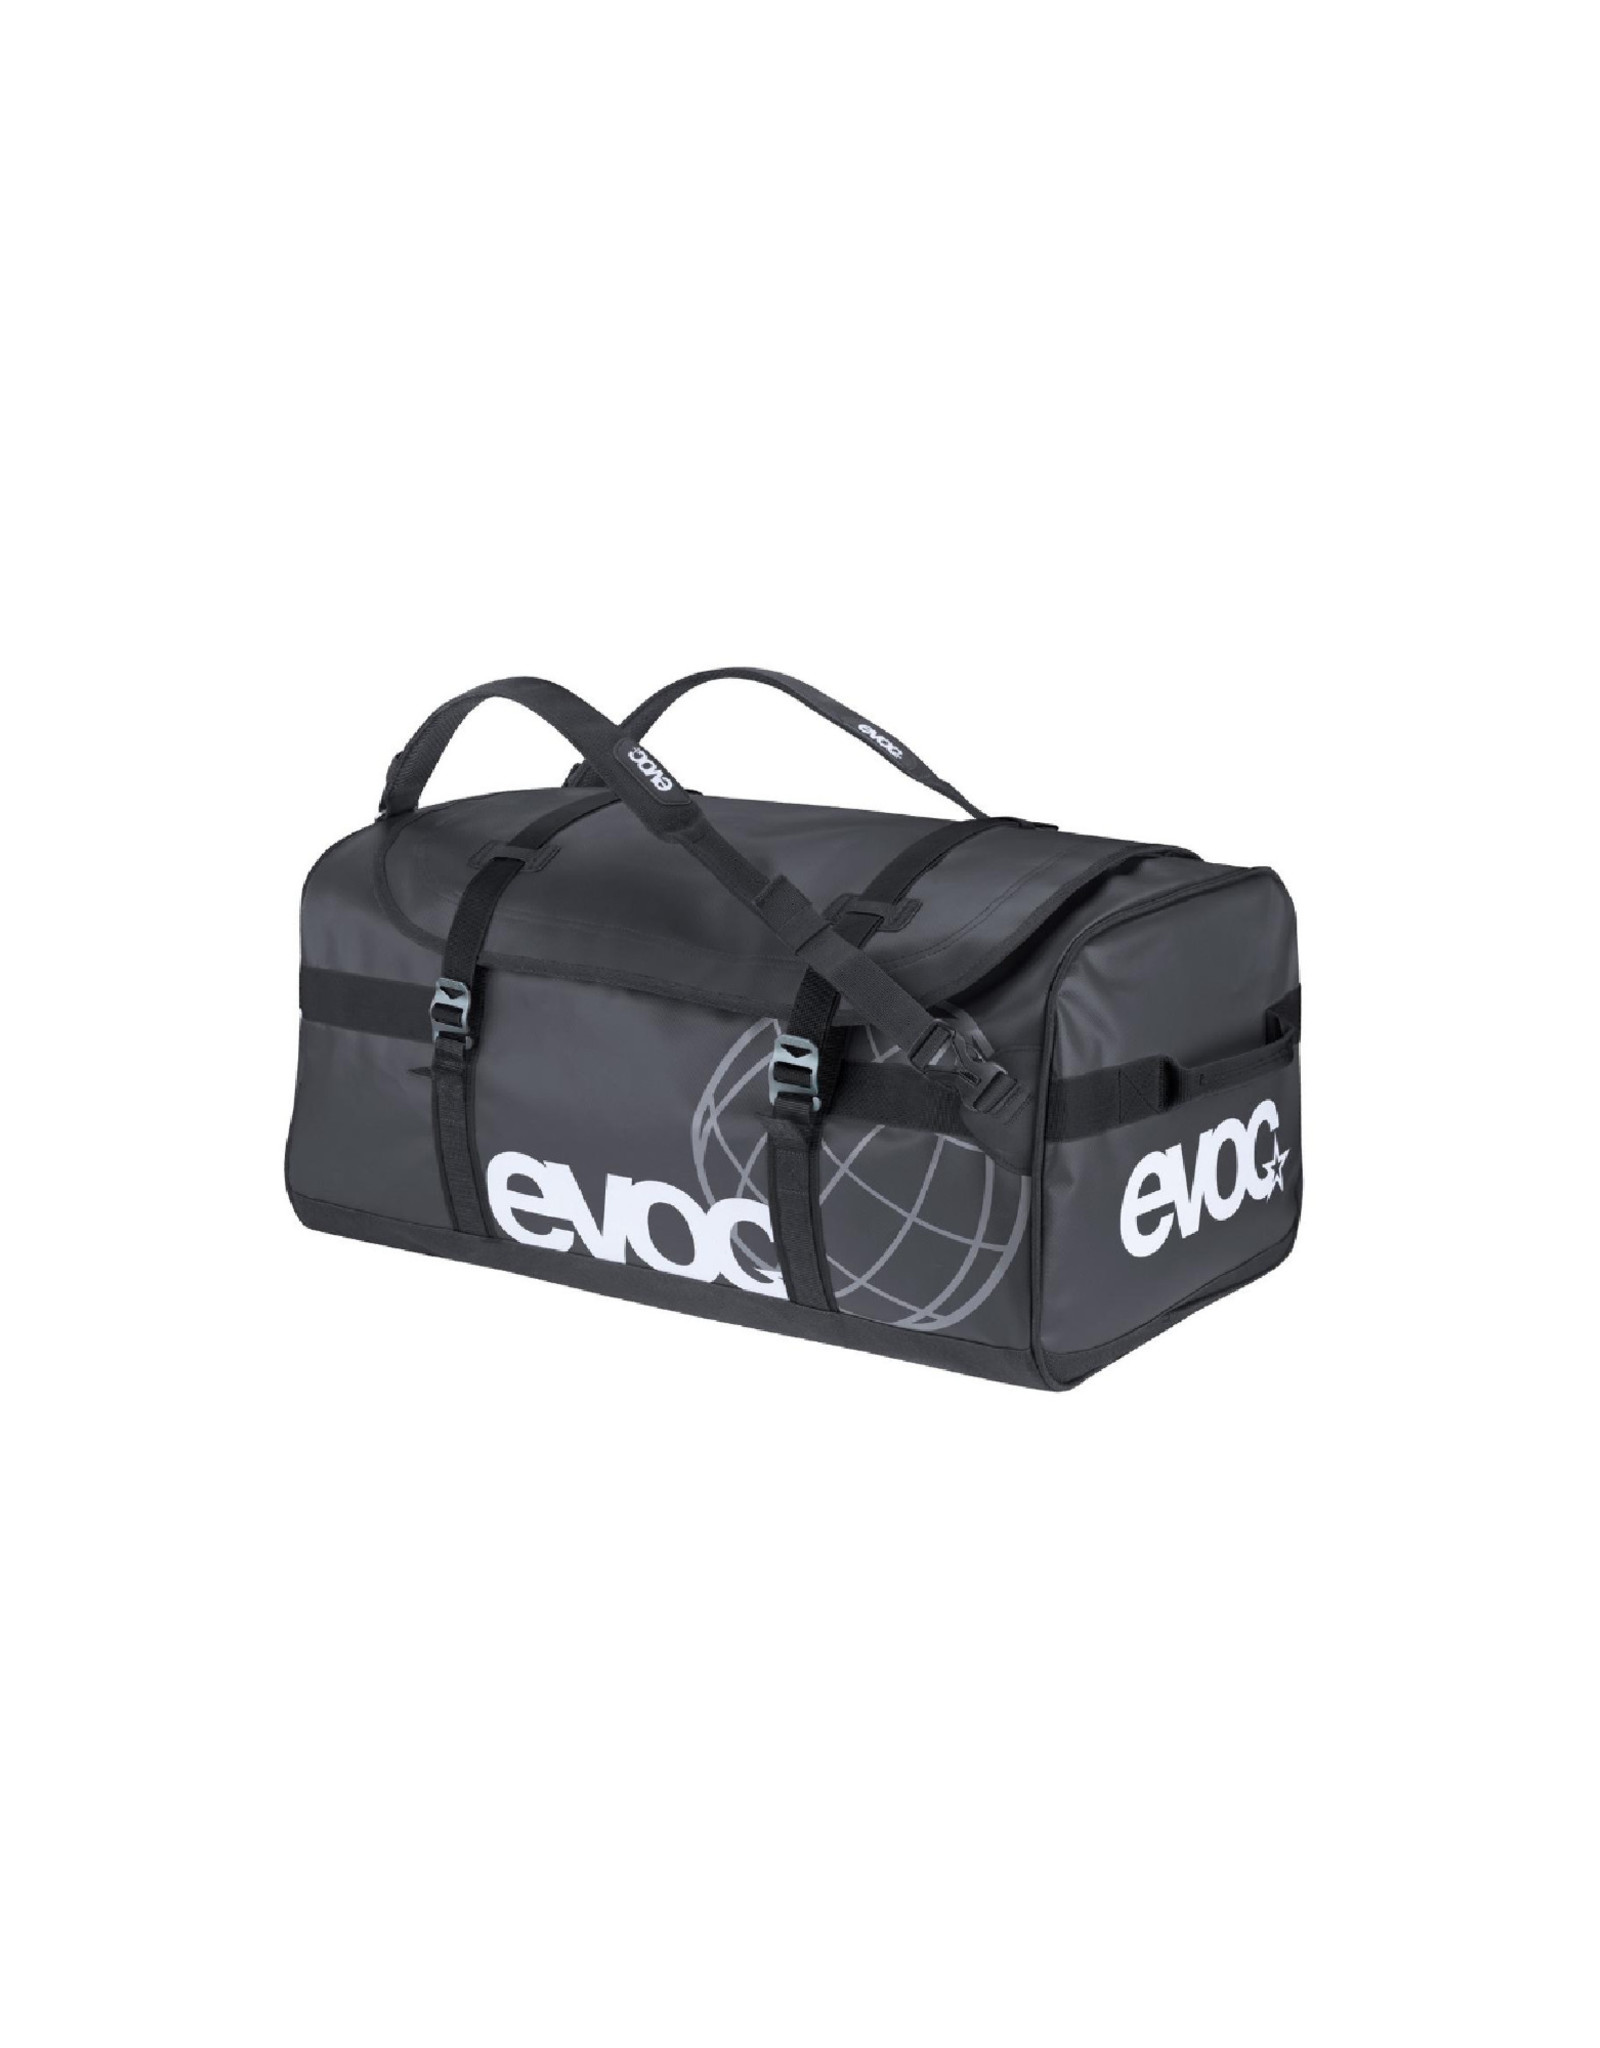 Evoc Evo Duffle Bag 100L, sac de voyage 100L, Noir